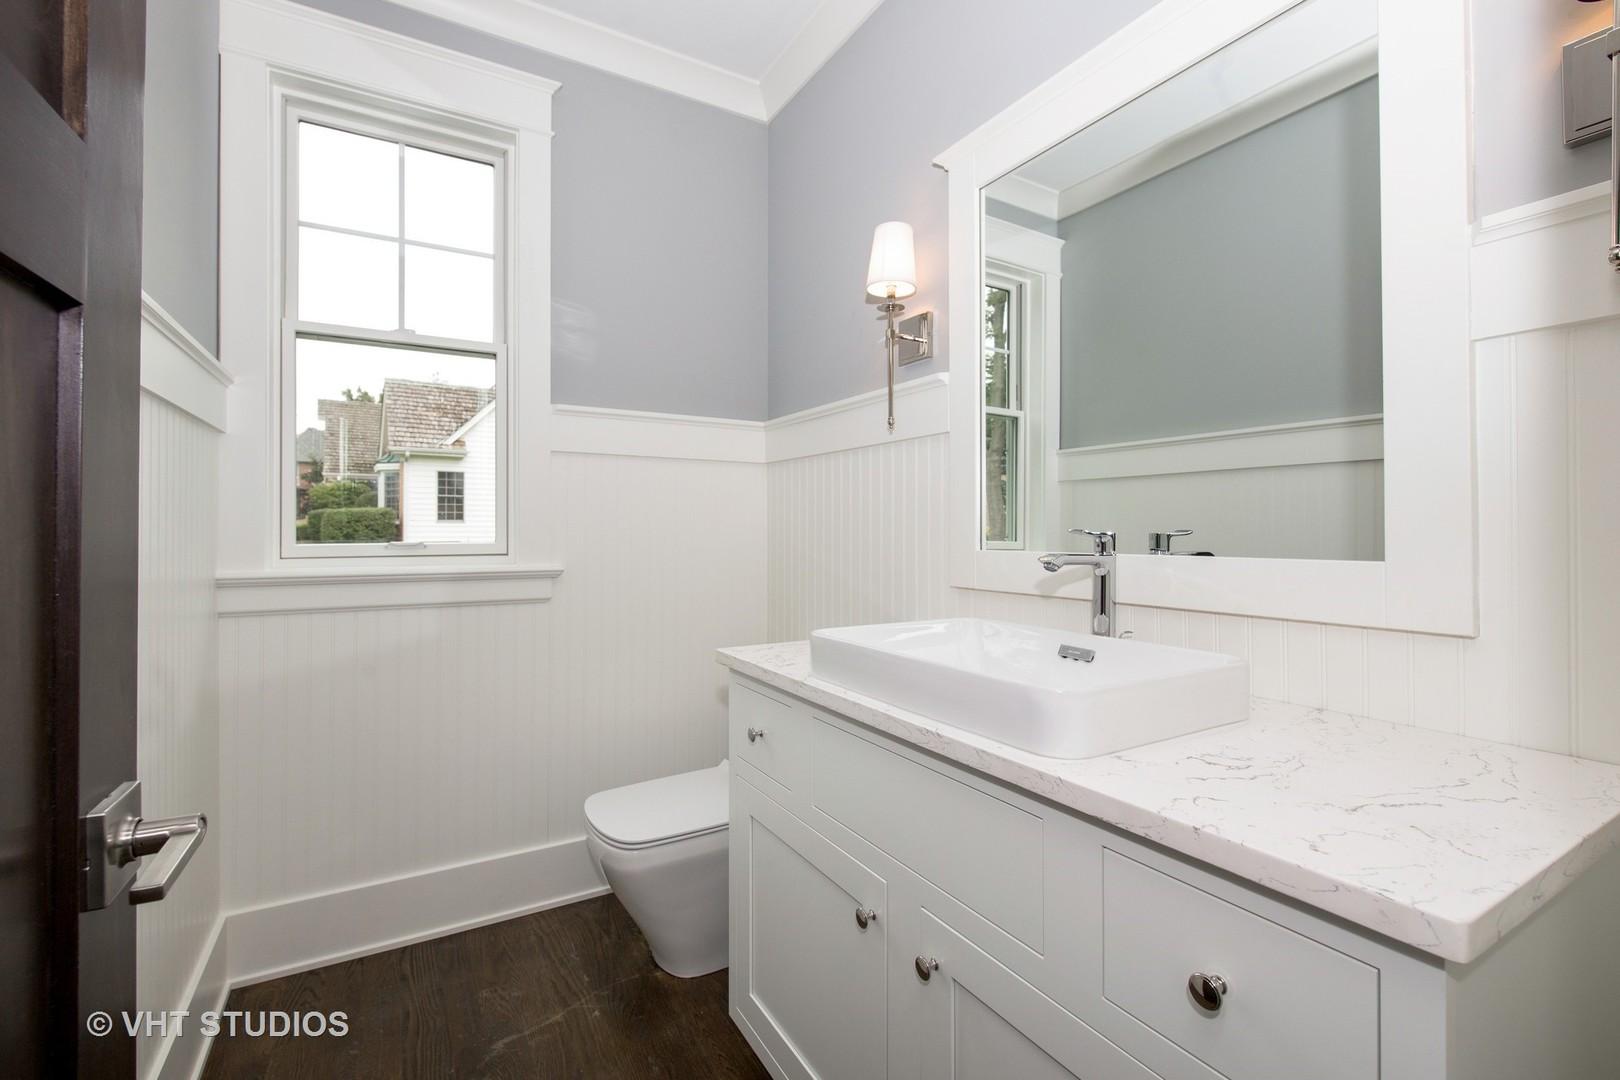 445 S Parkside AVE, Elmhurst, IL, 60126, single family homes for sale